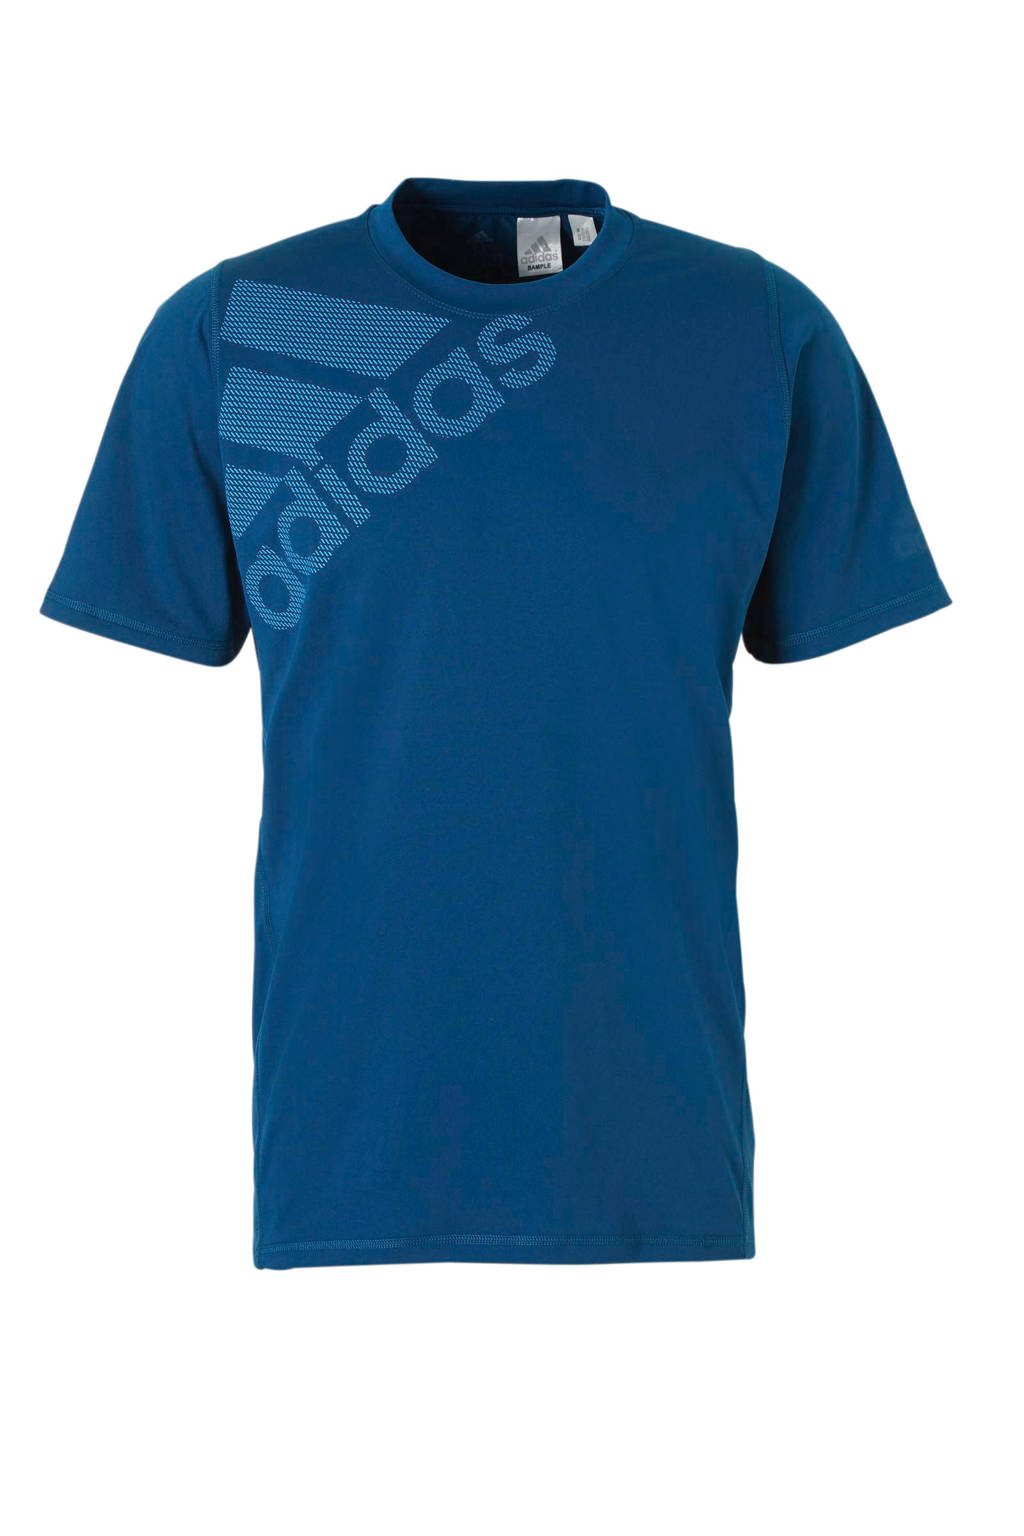 adidas performance   sport t-shirt petrol, Petrol